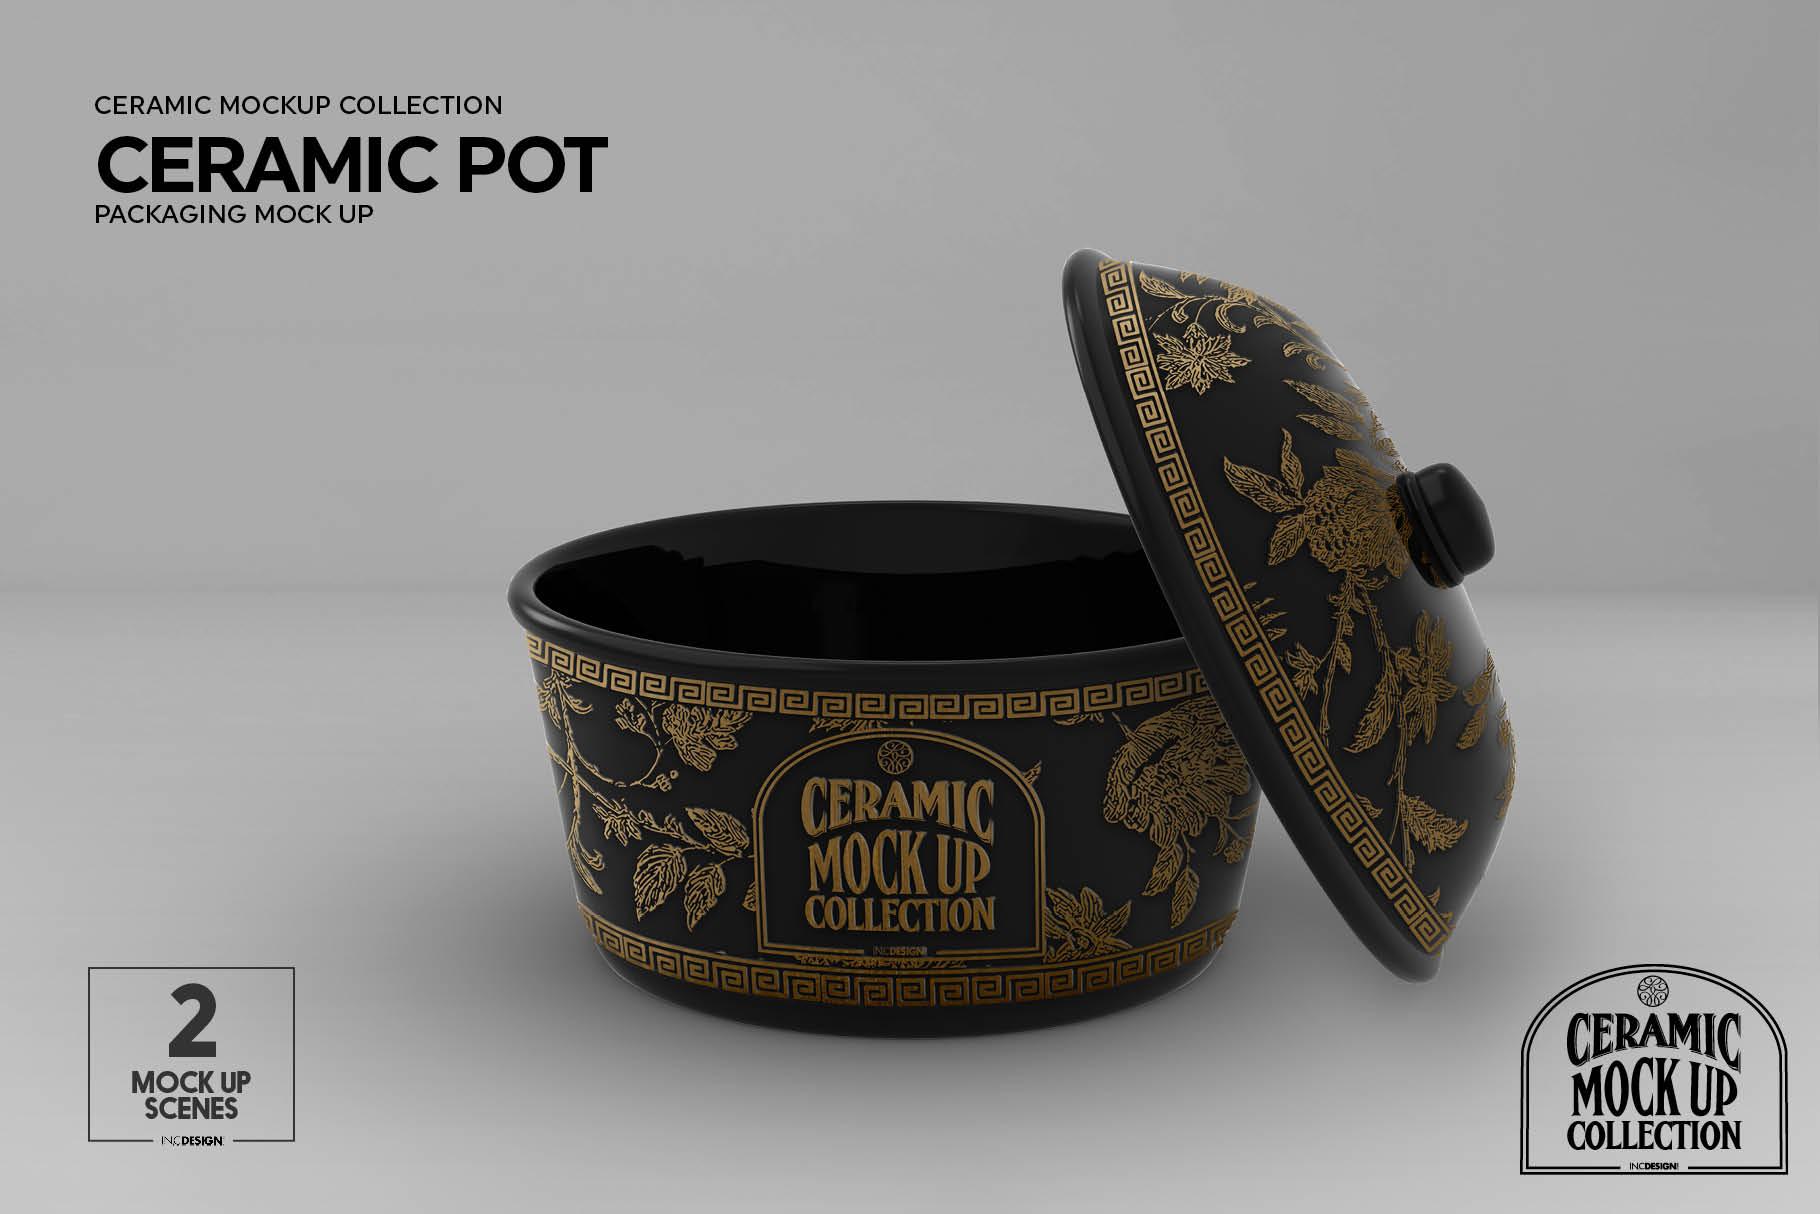 Ceramic Pot Packaging Mock Up example image 4